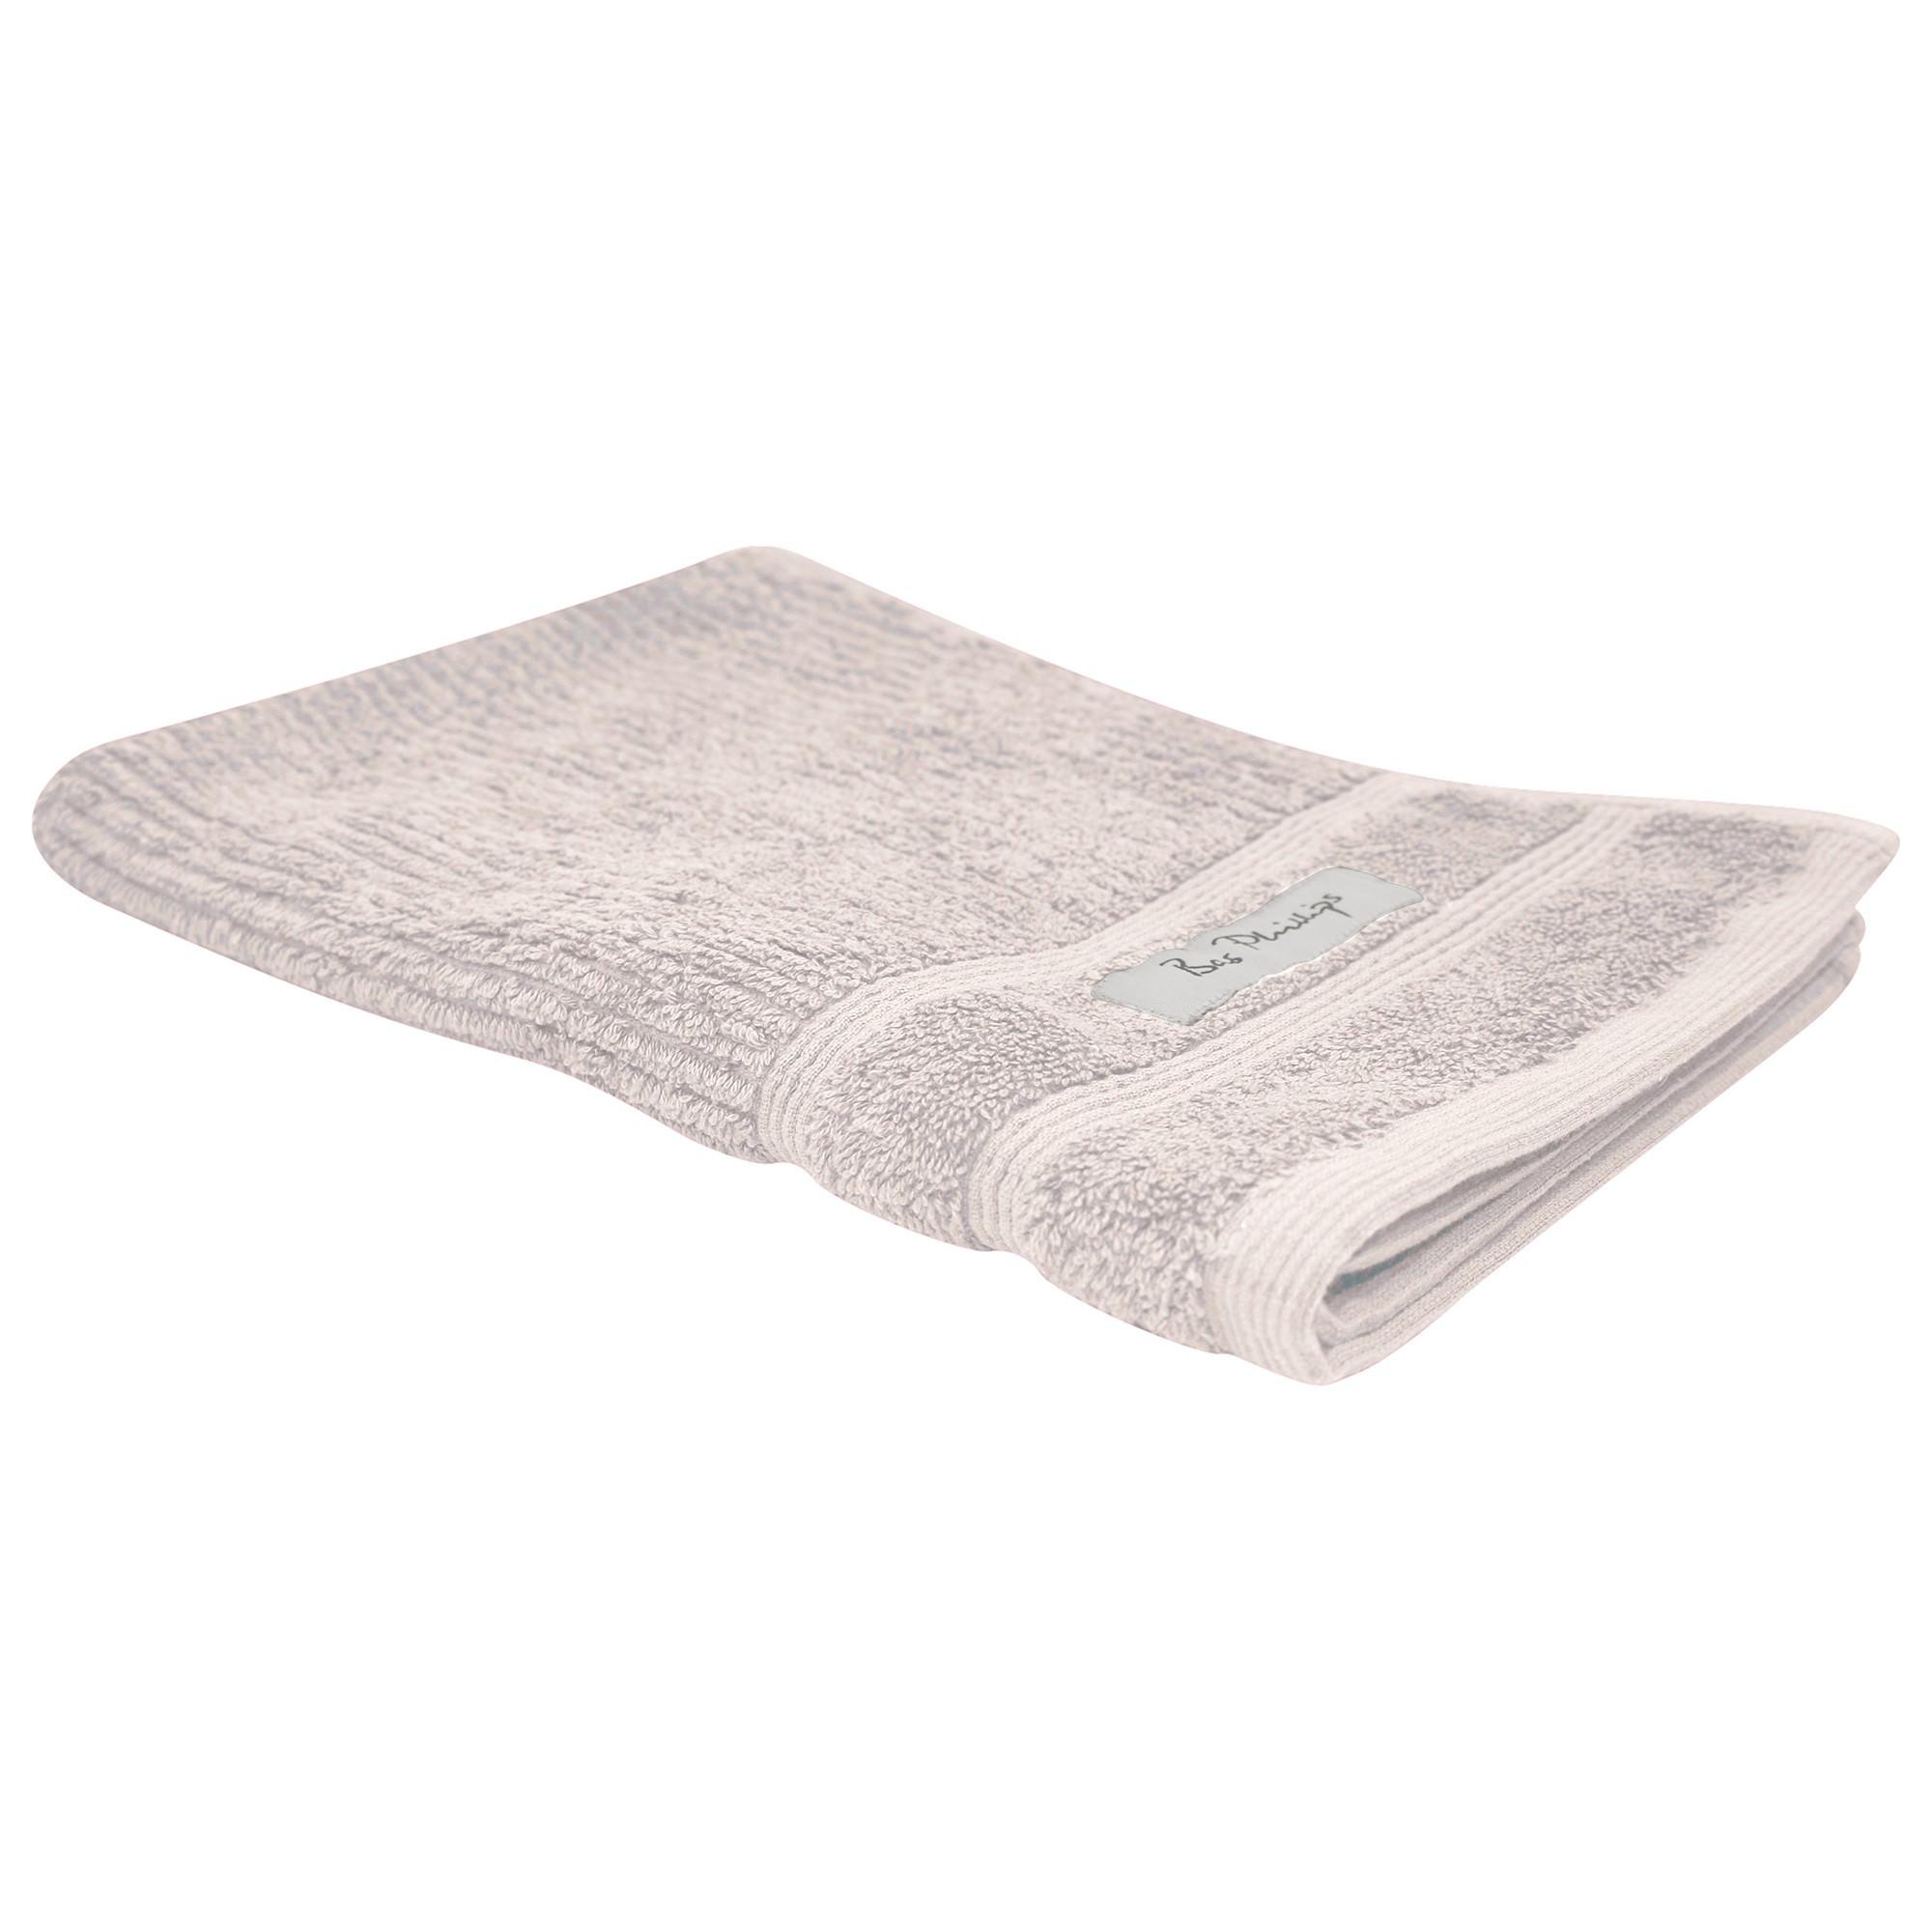 Bas Phillips Cairo Egyptian Cotton Hand Towel, Desert